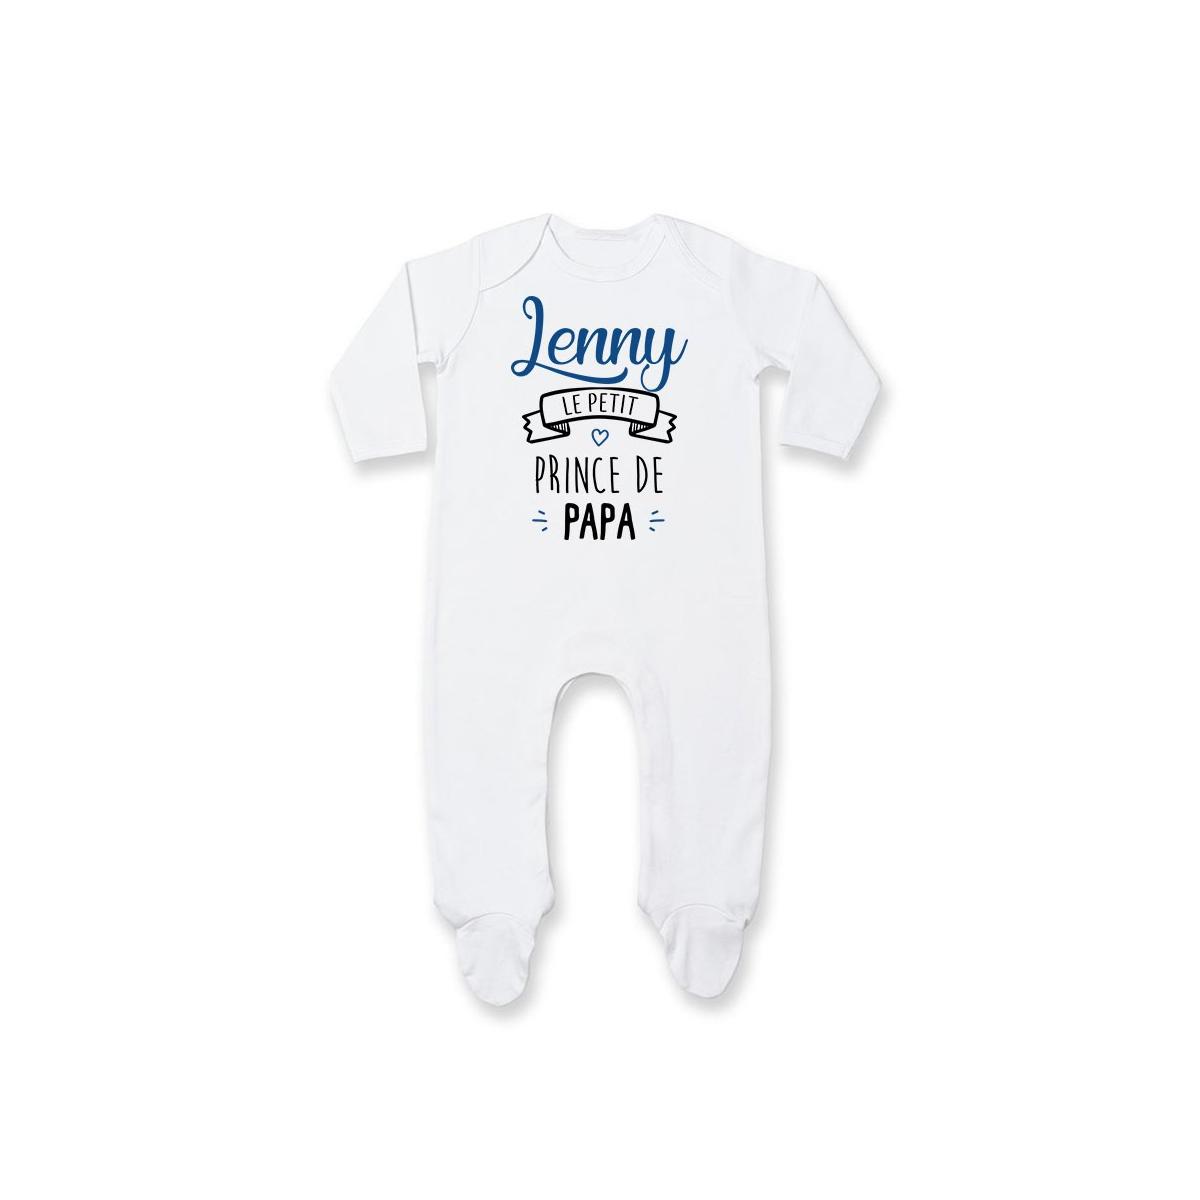 "Pyjama bébé personnalisé "" prénom "" le petit prince de papa"